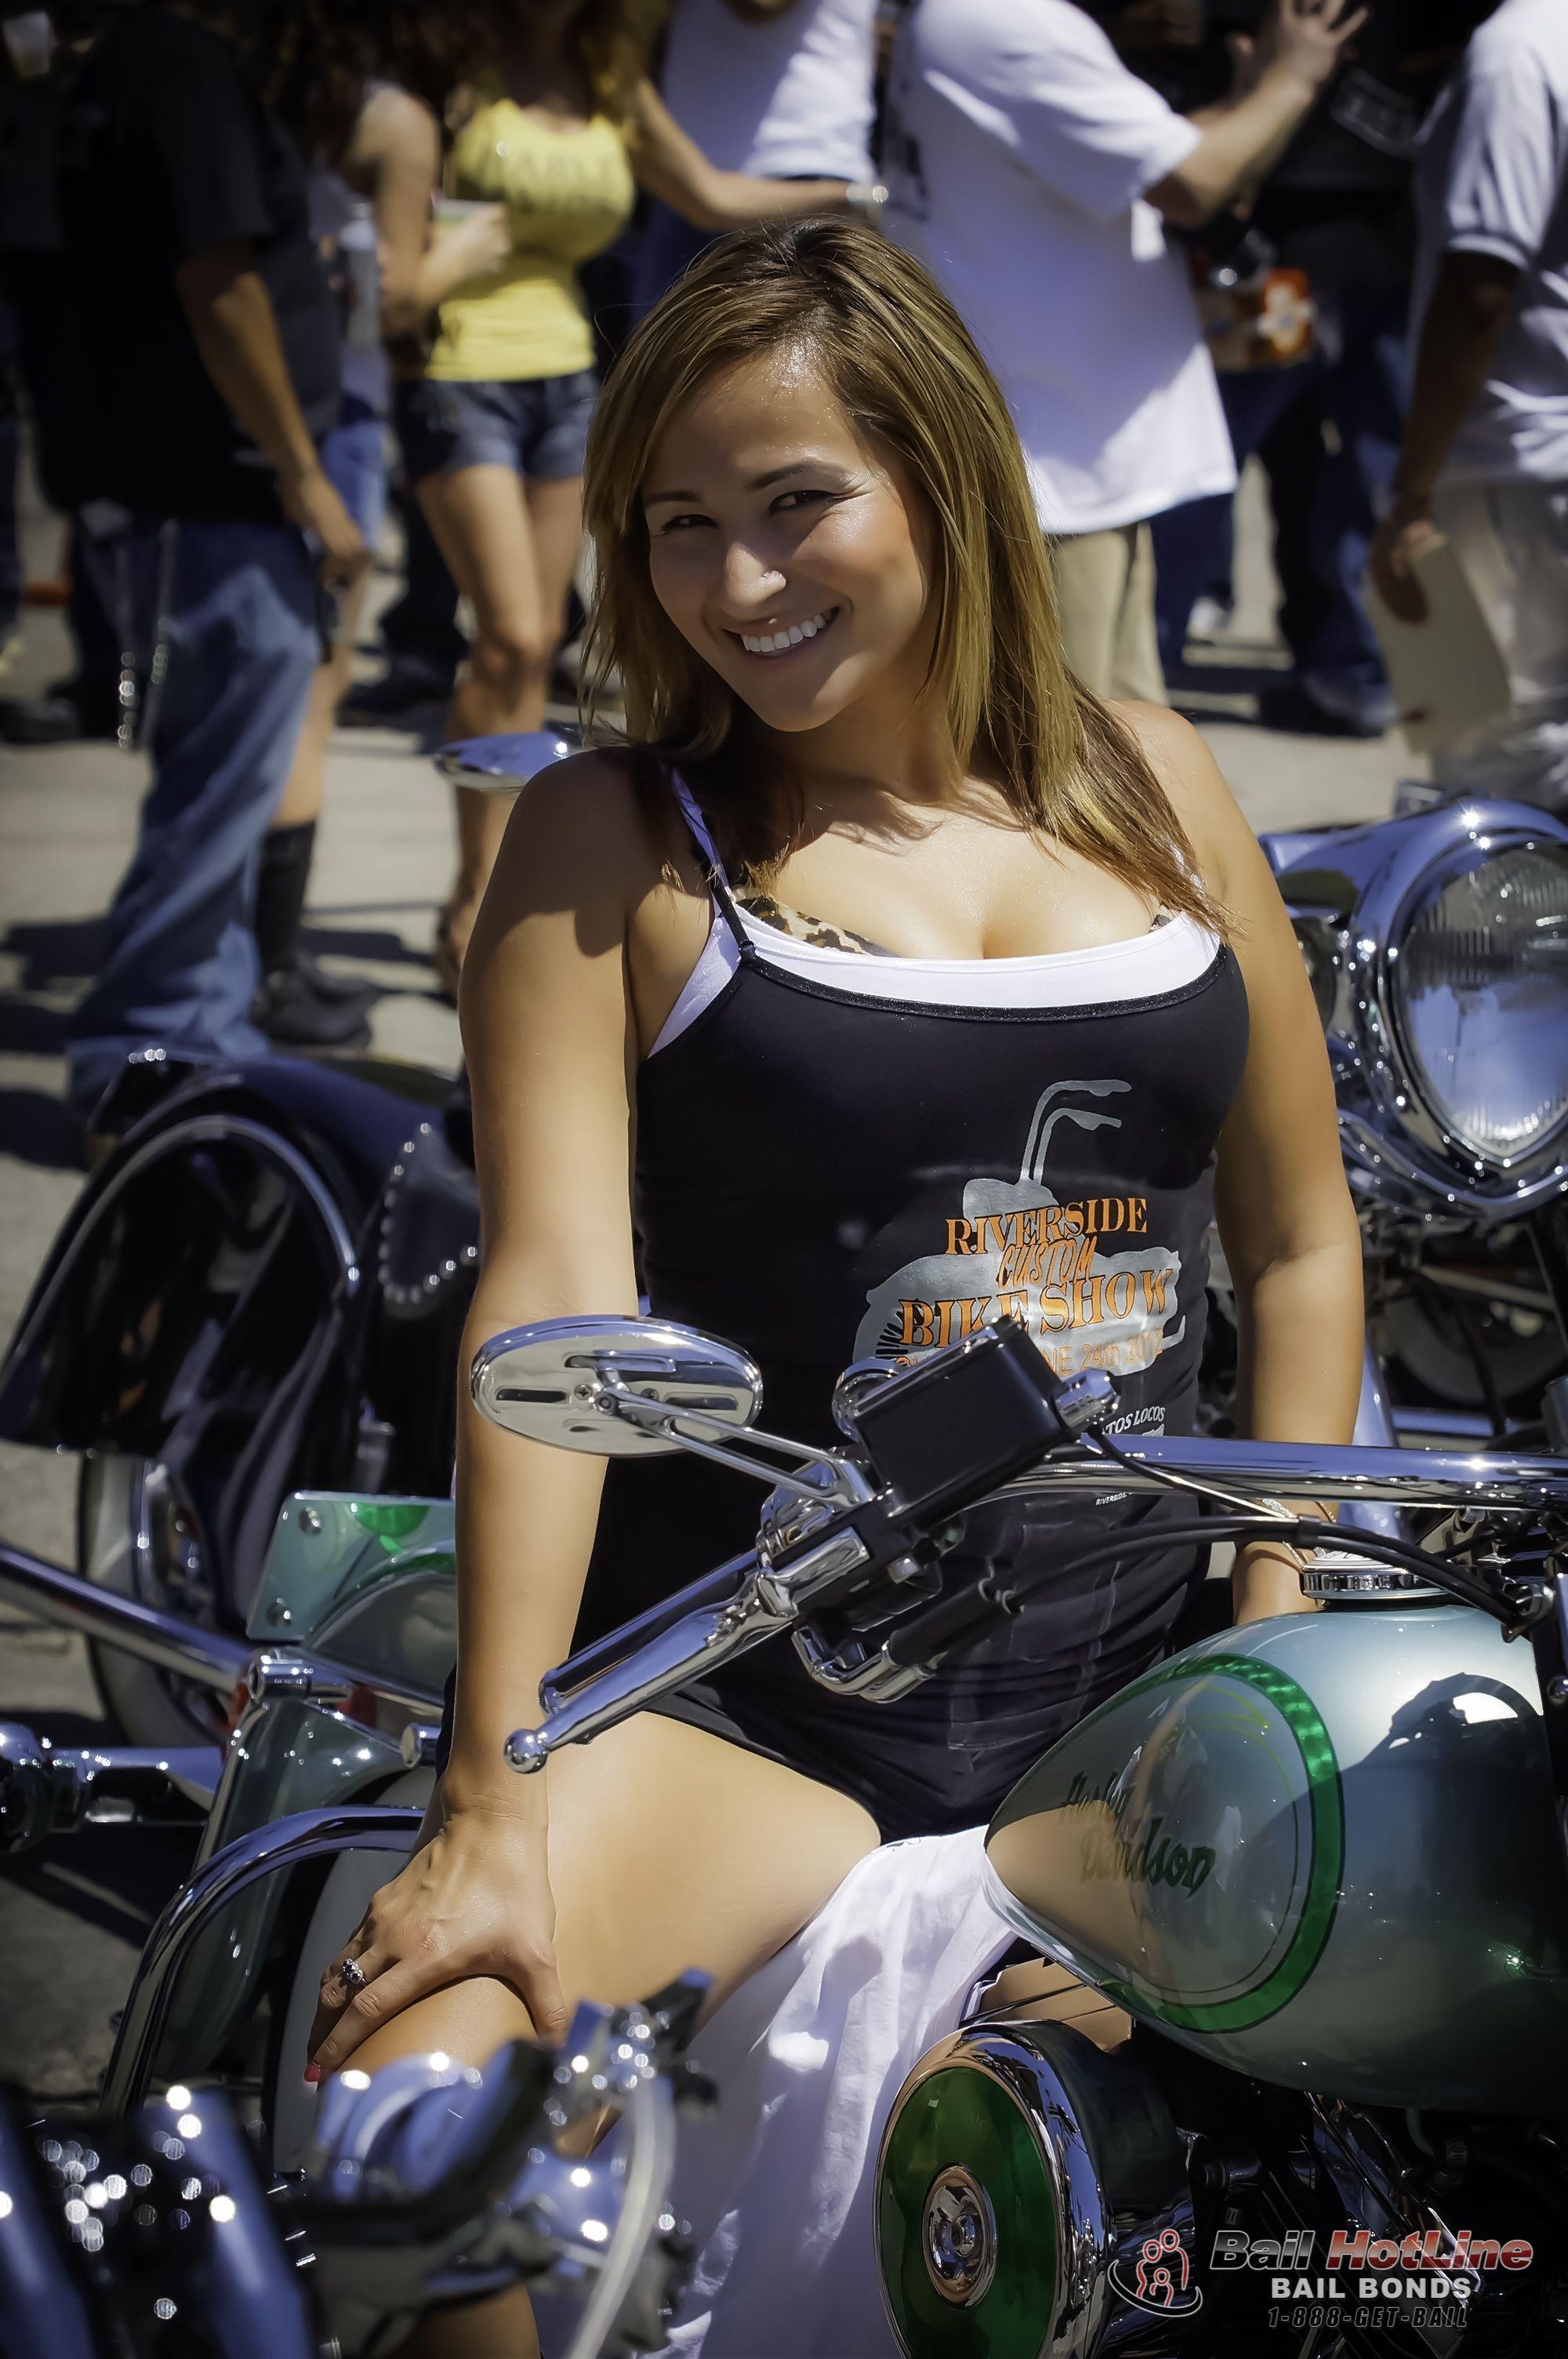 Oz Bike Show Girls | Bankstown Custom Motorcycle Show 2012 ... |Custom Motorcycle Show Models